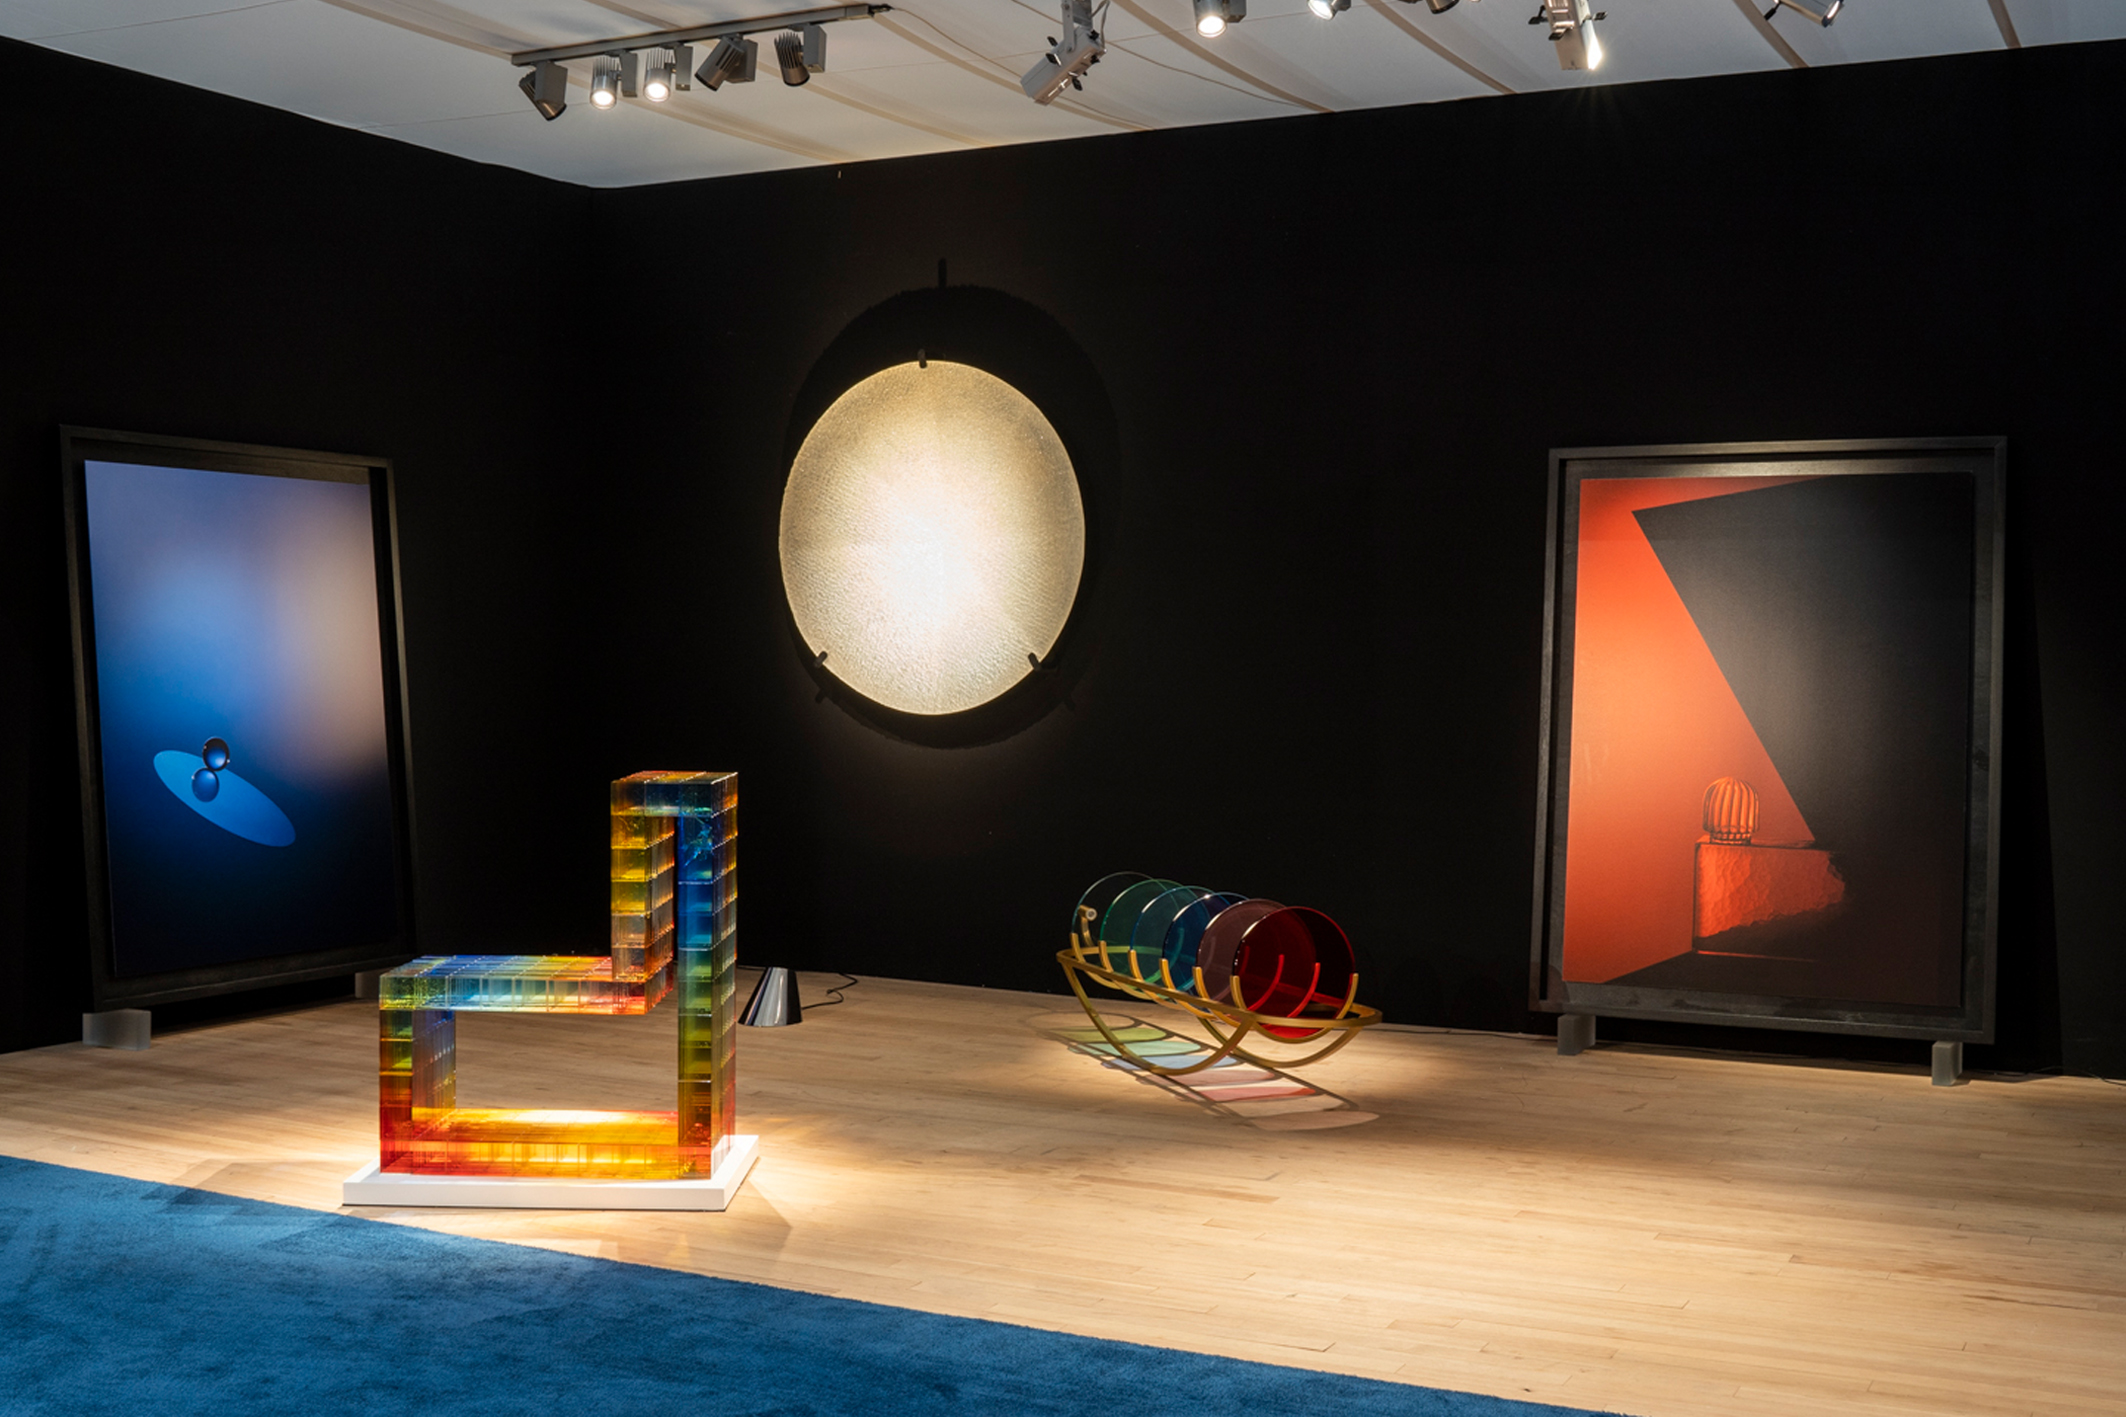 Salon Du Design Milan 2019 events | wonderglass | highlights from around the world